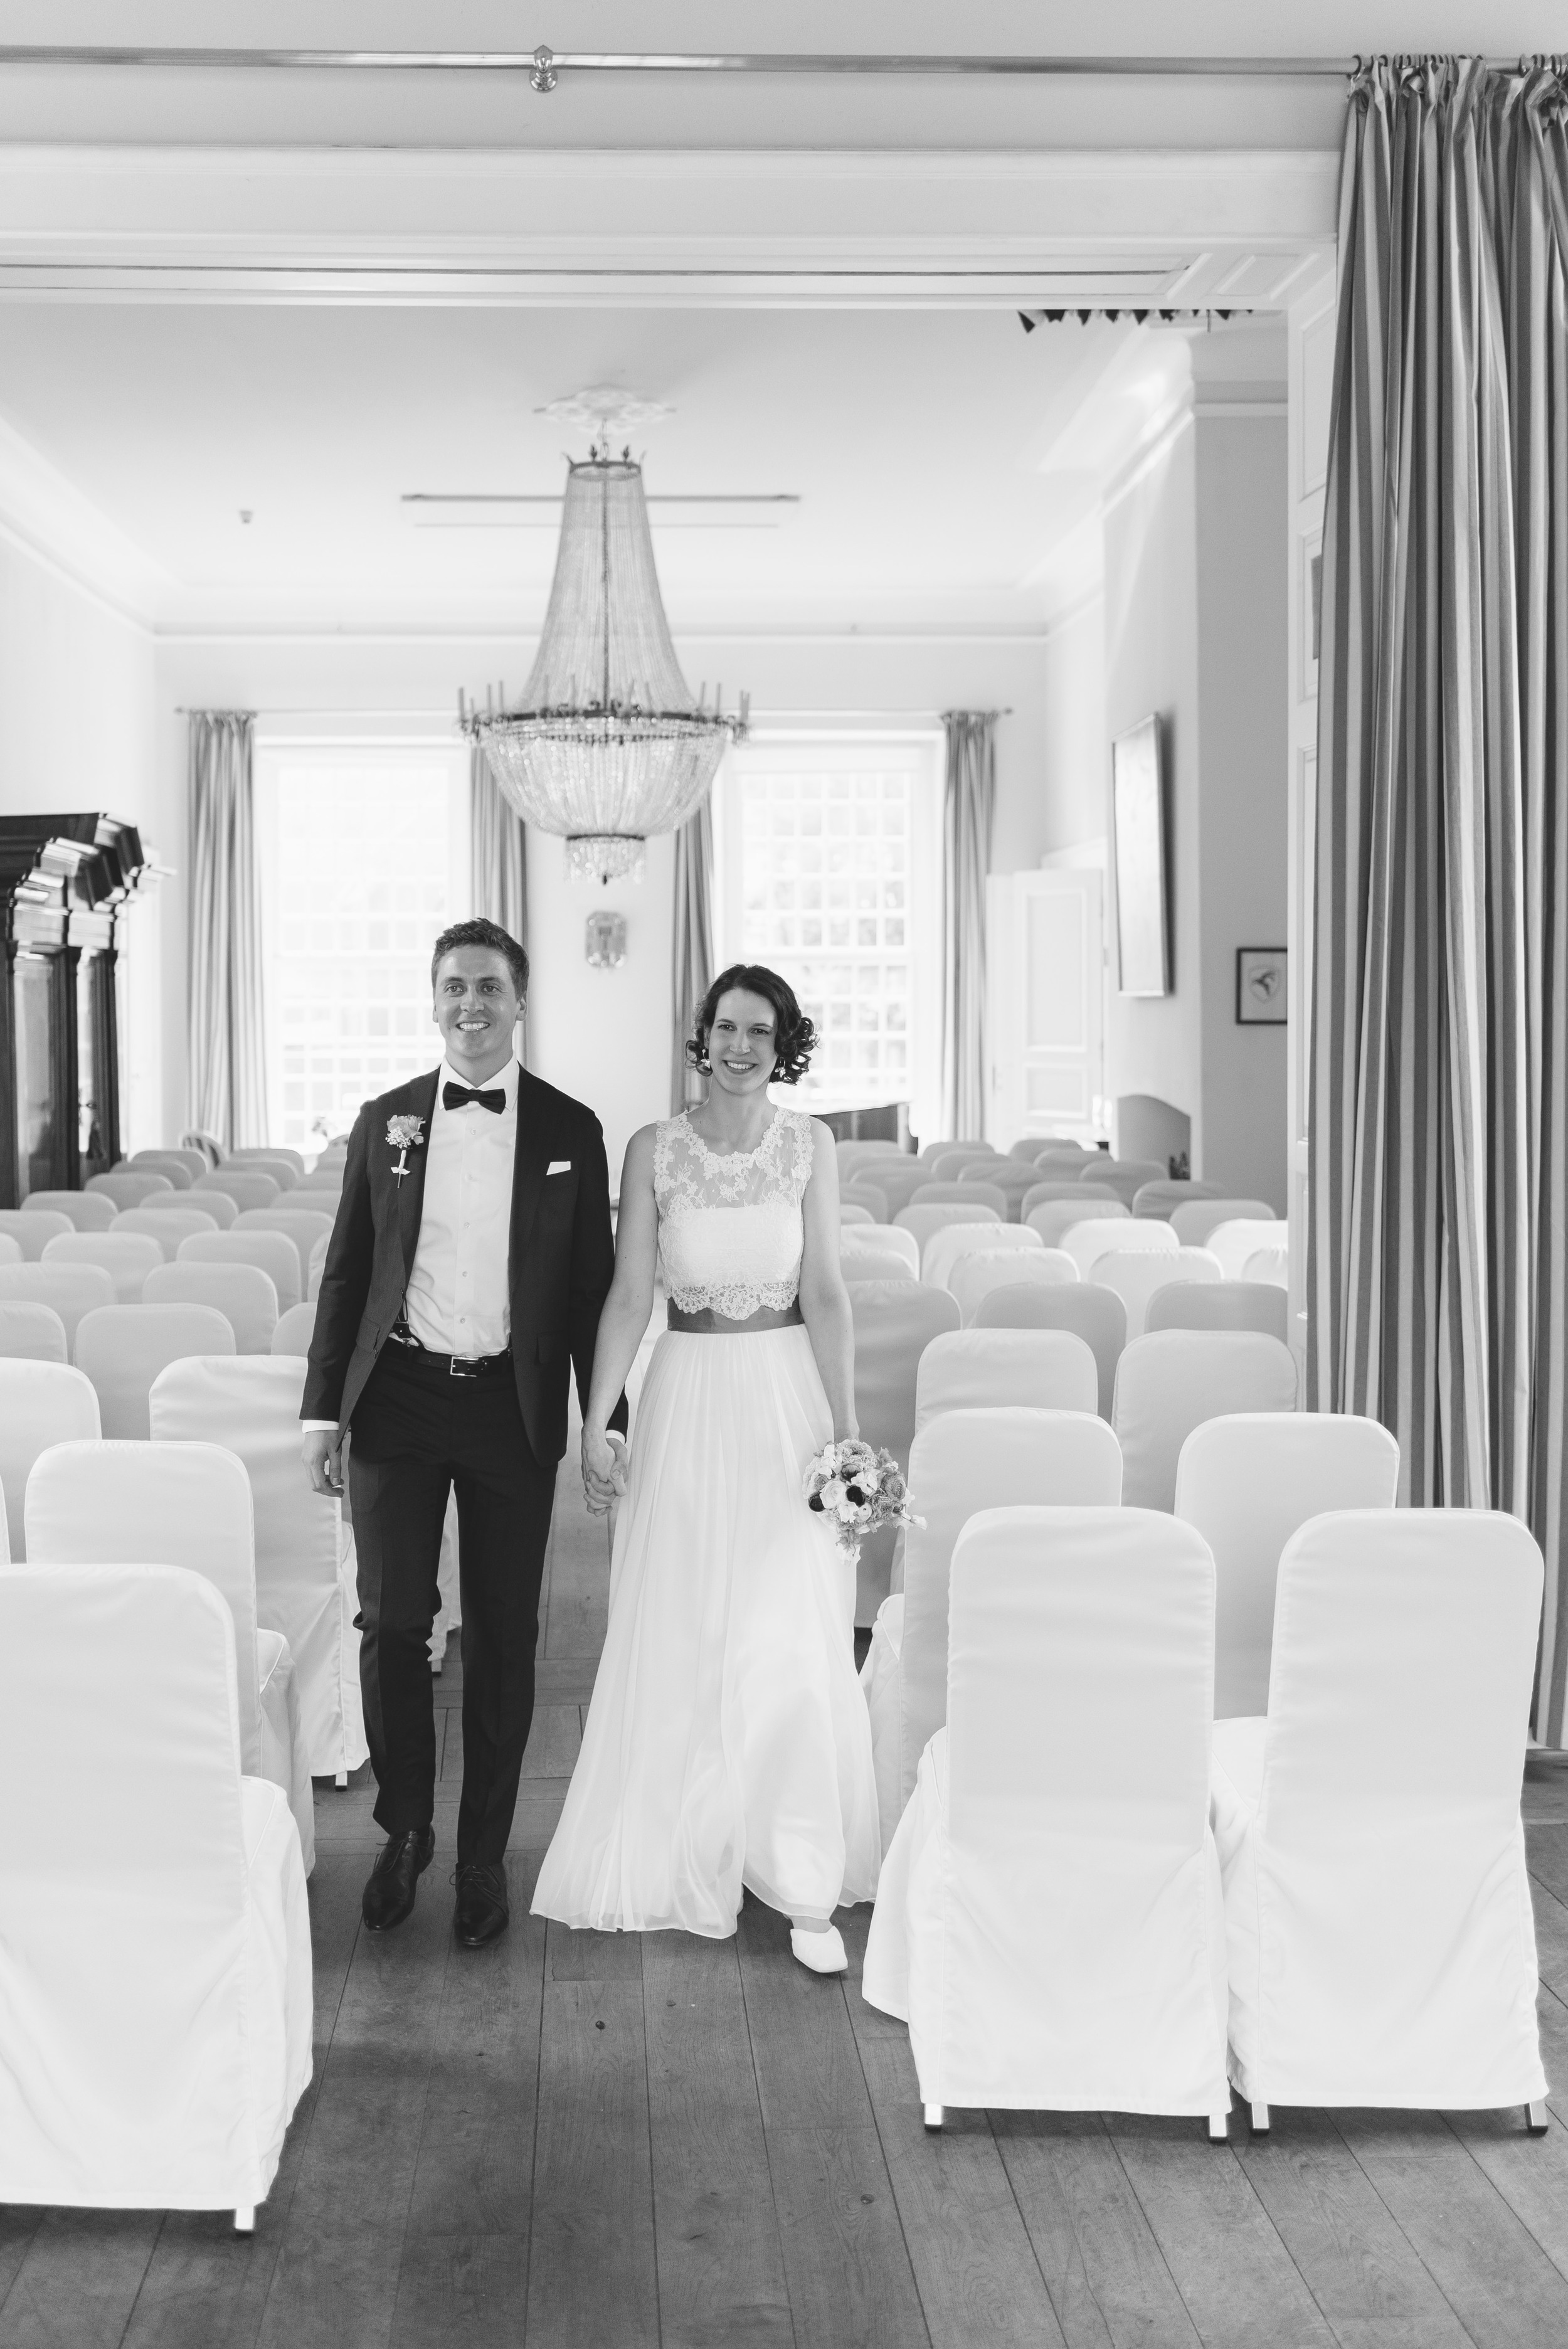 Hochzeitsfotograf-Schlossruine-Hertefeld-Weeze-085.jpg